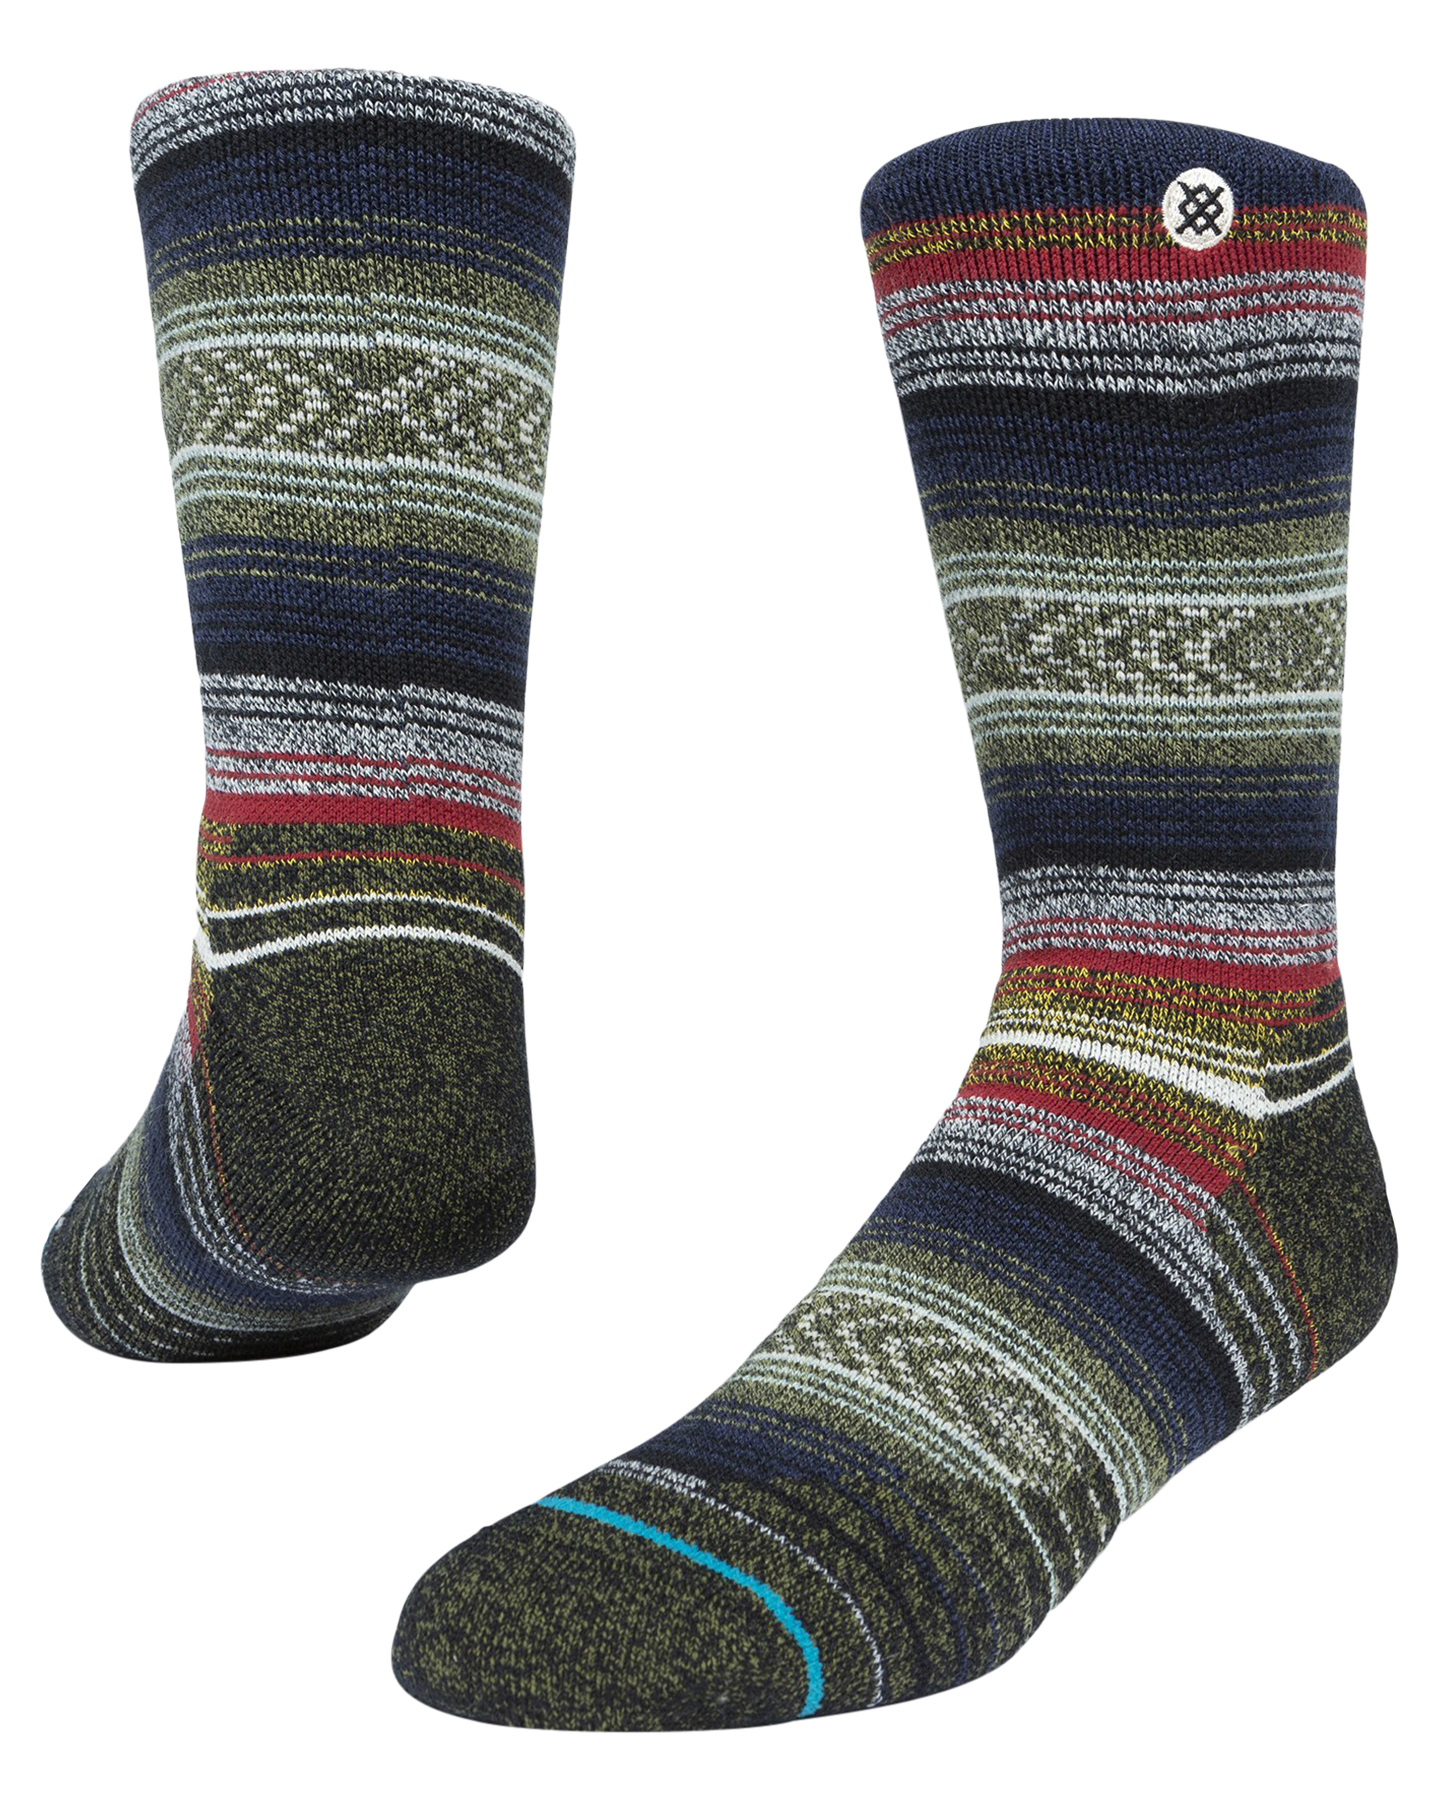 Stance Windy Peak Sock Black